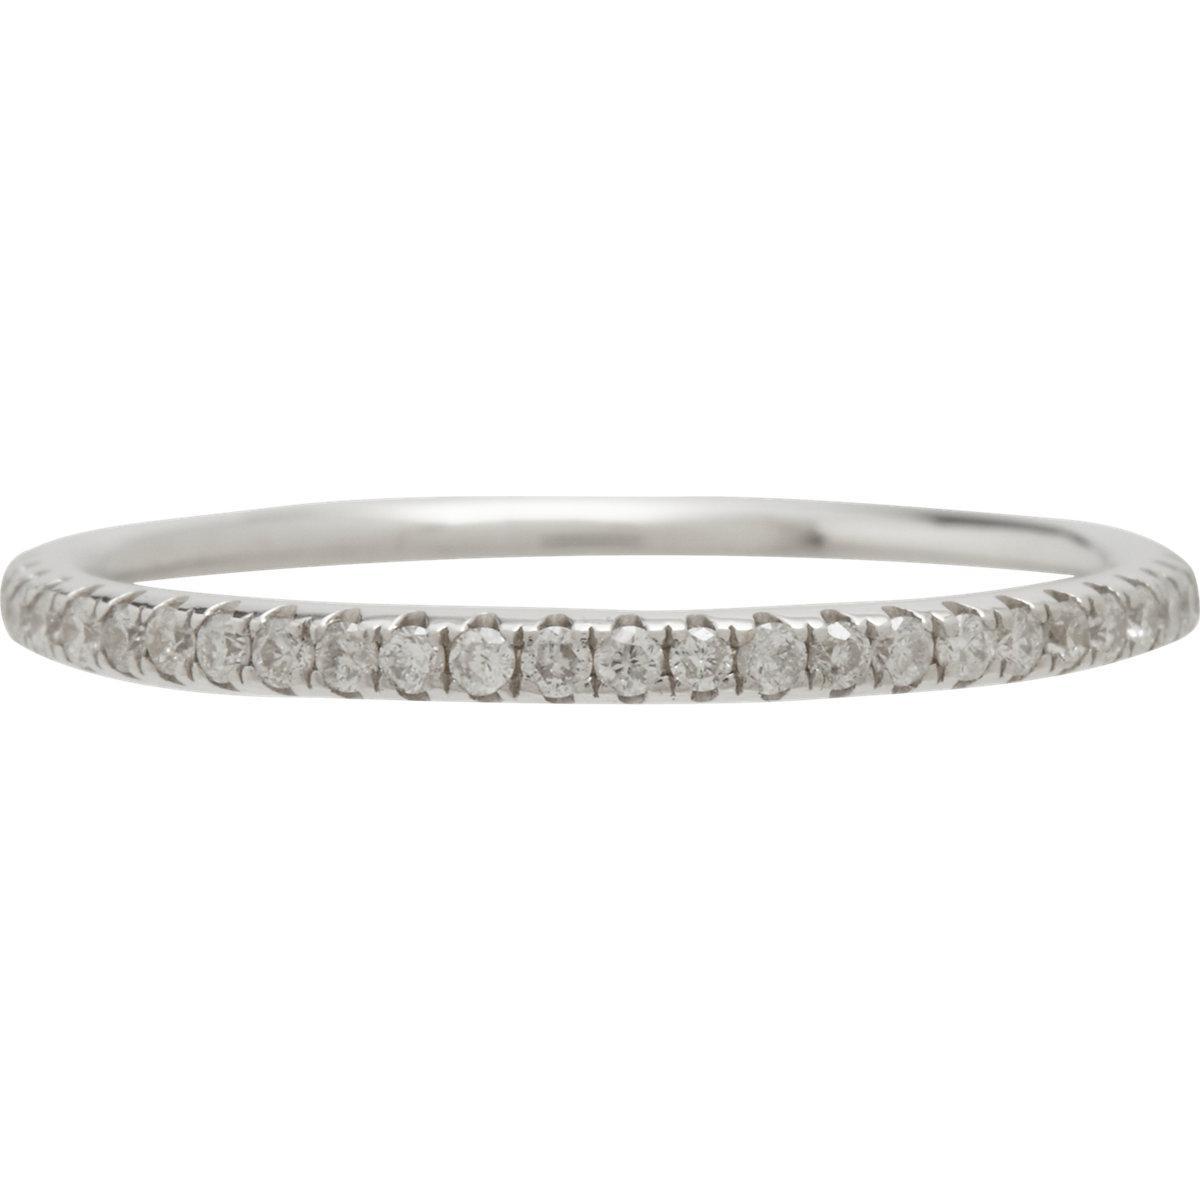 Ileana Makri Diamond End Ring in Metallics mnOEk